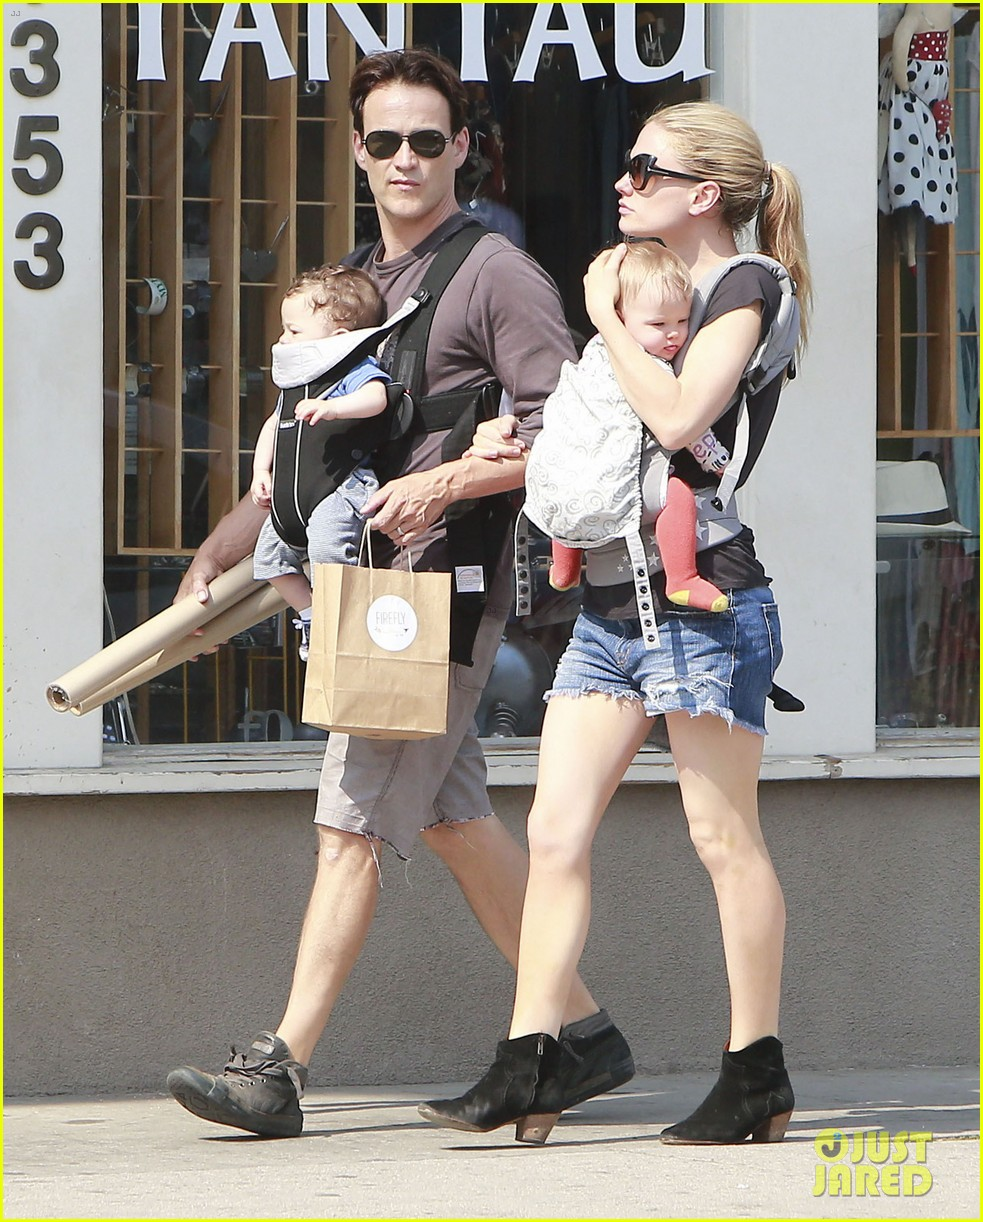 Анна пакуин с детьми фото